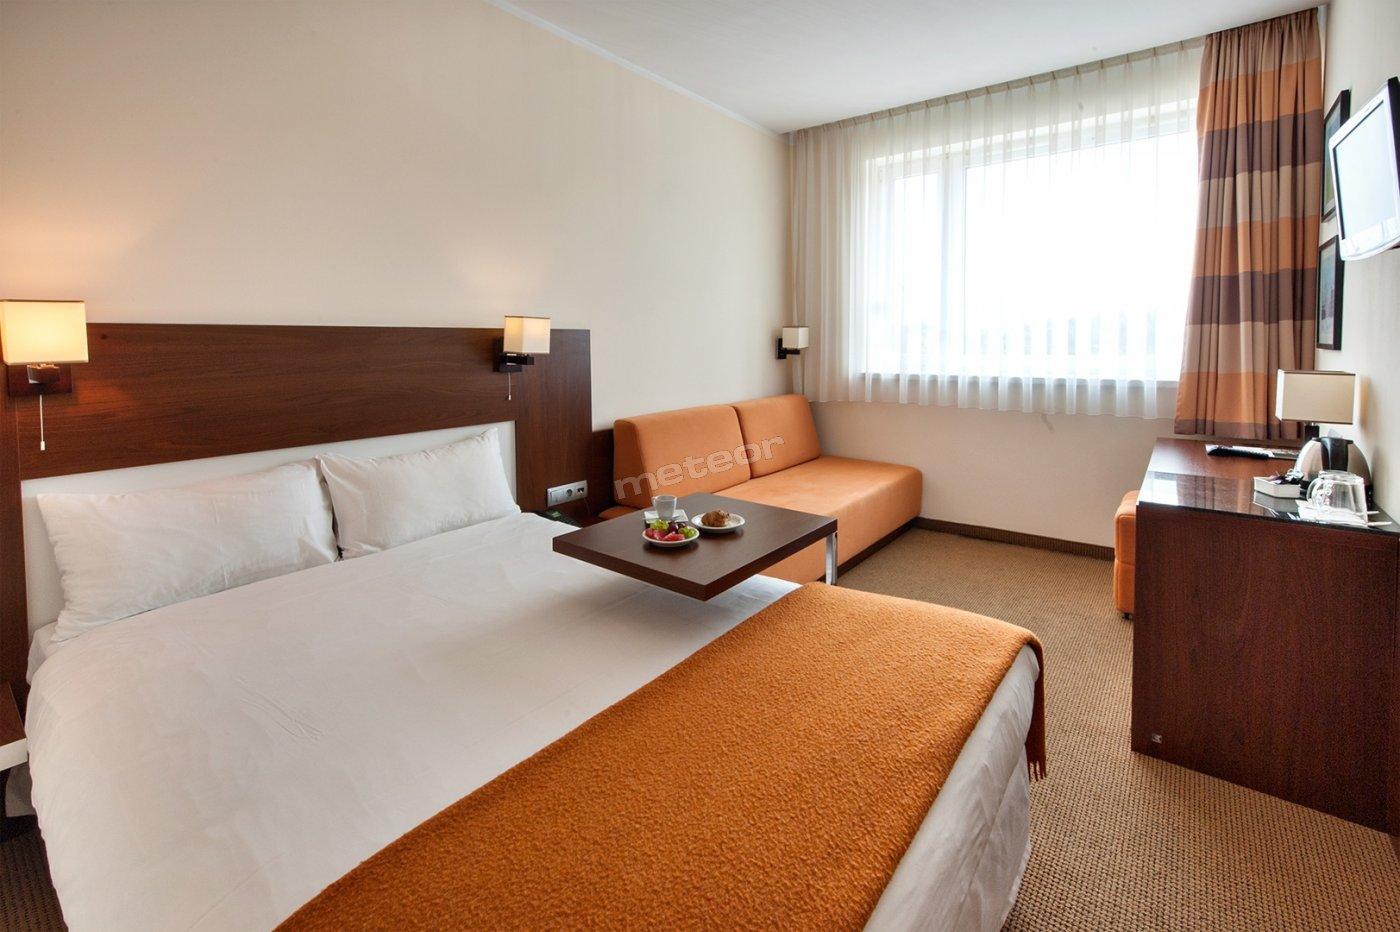 Hotel De Silva Pyrzowice